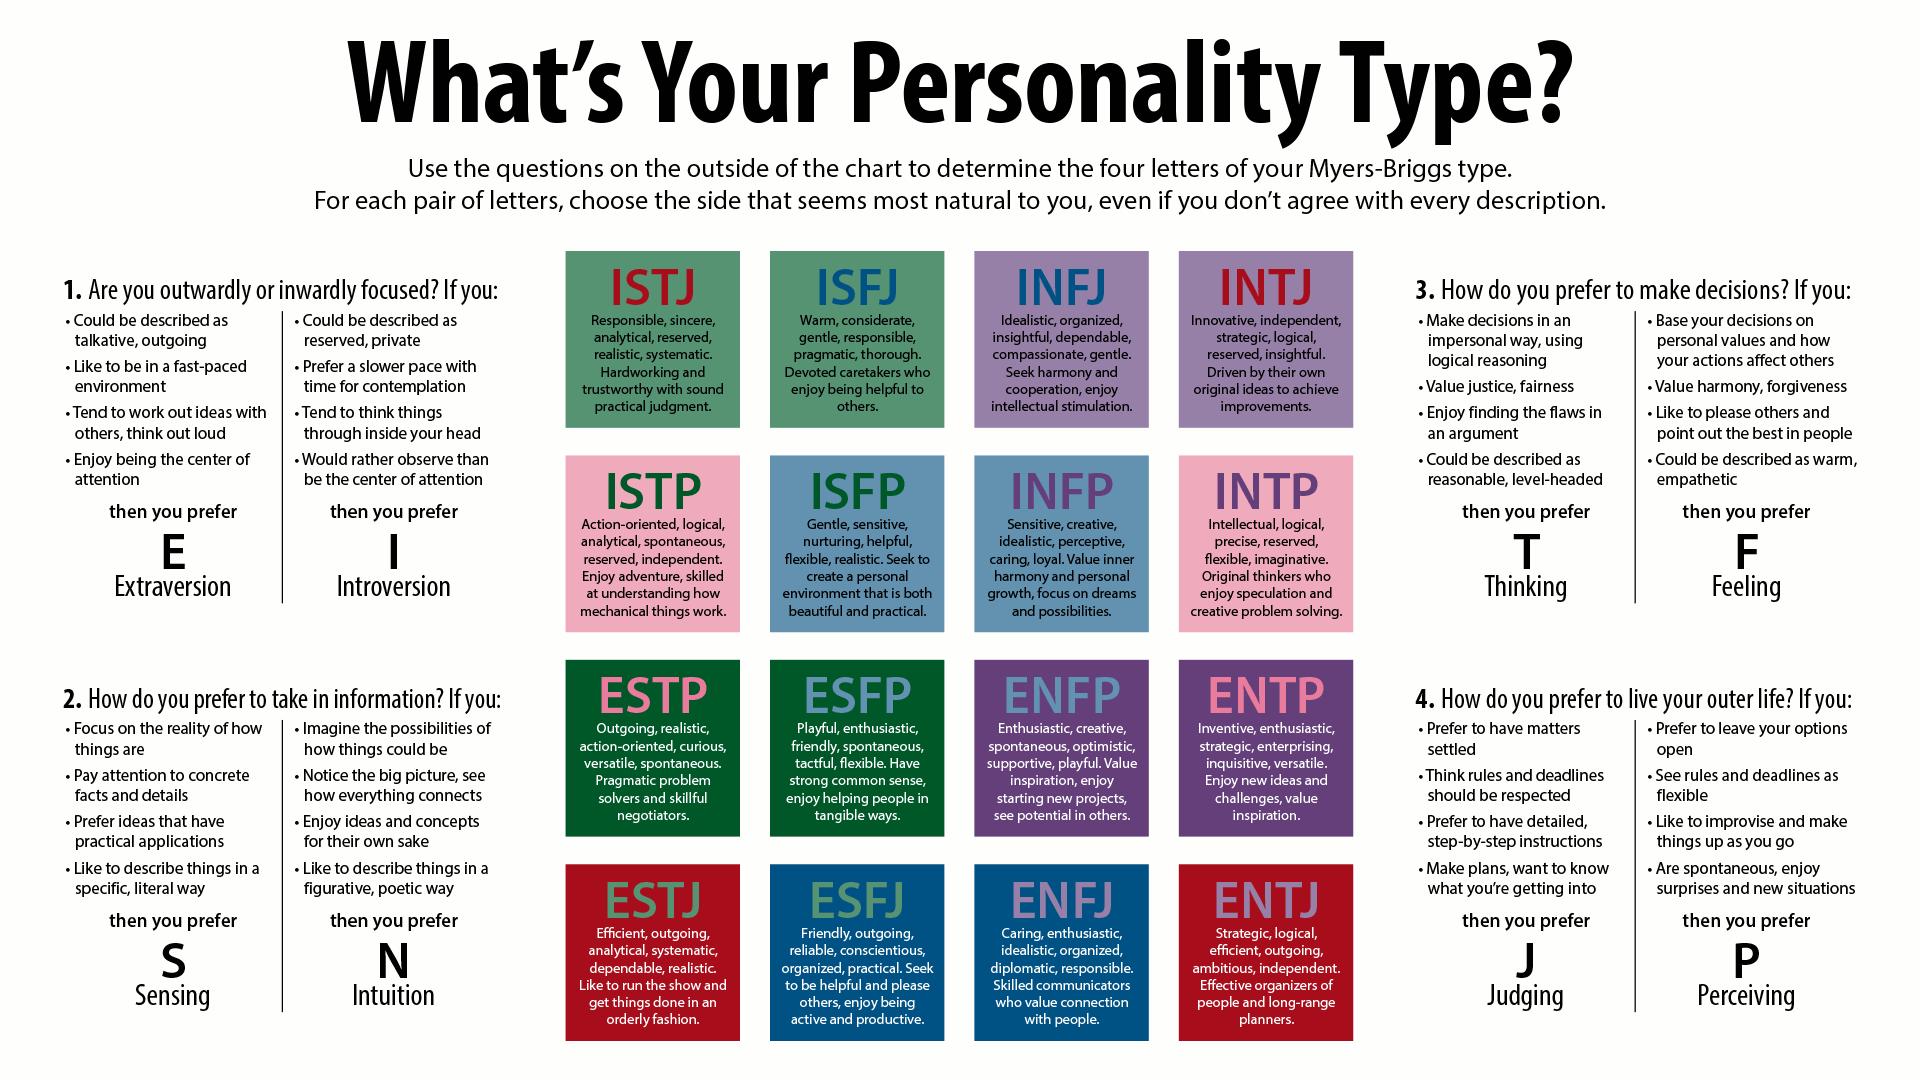 چقدر خودتون رو میشناسید؟